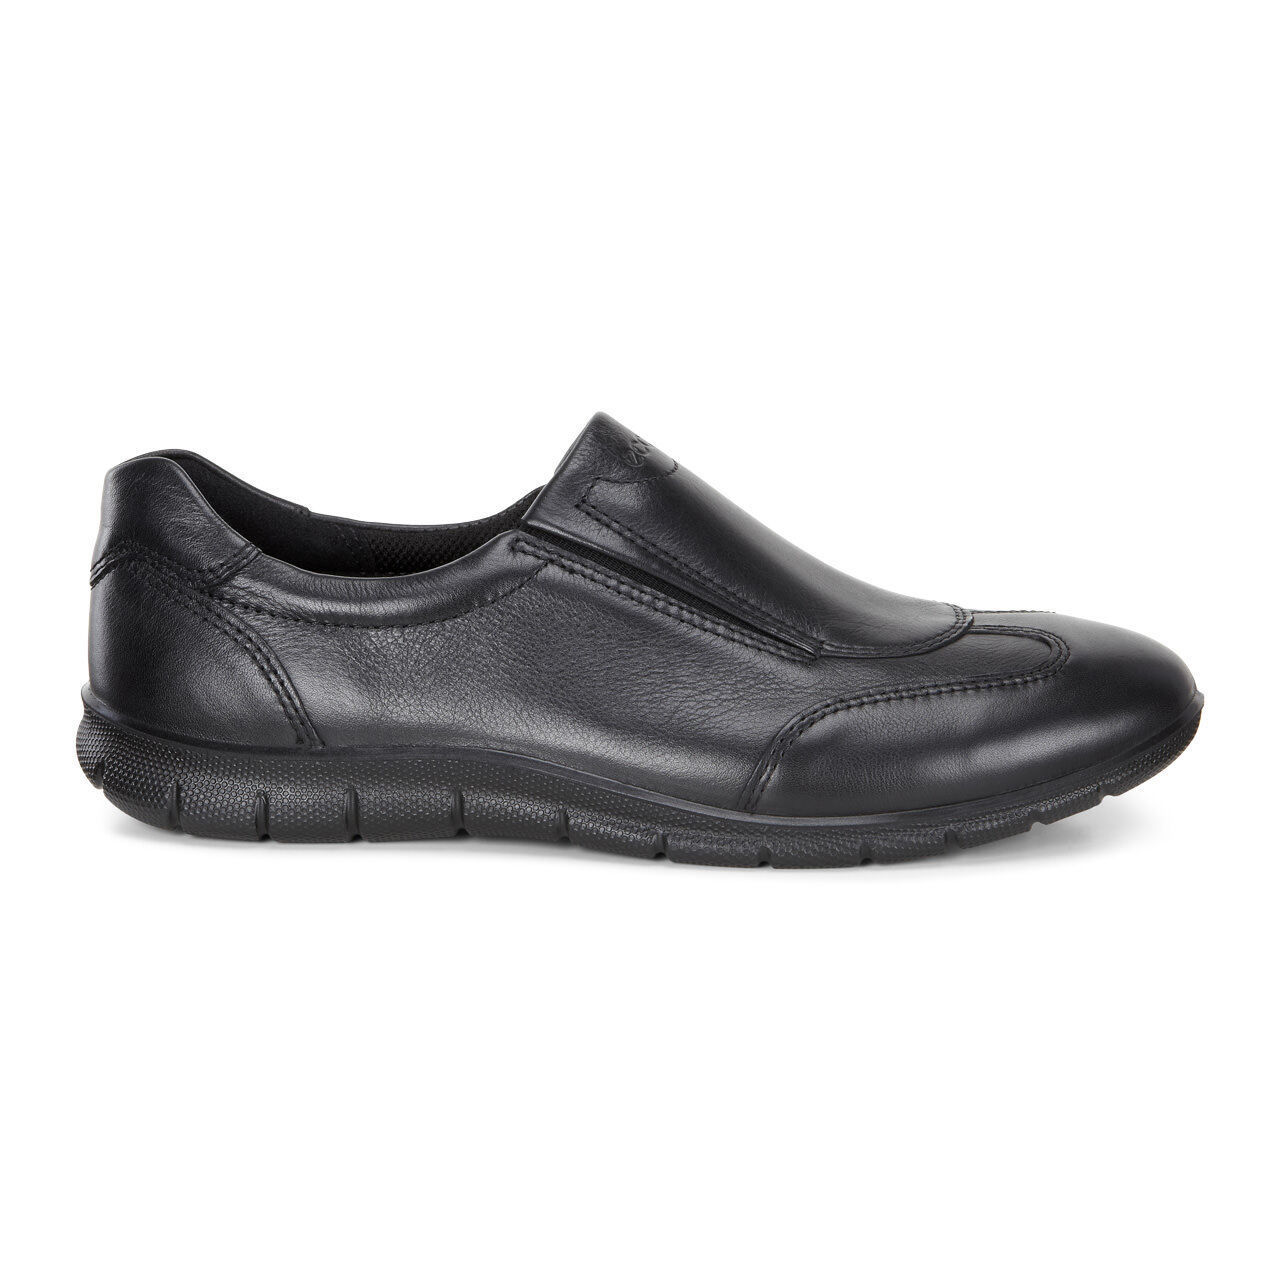 ECCO Babett II Slip On | Women's Shoes